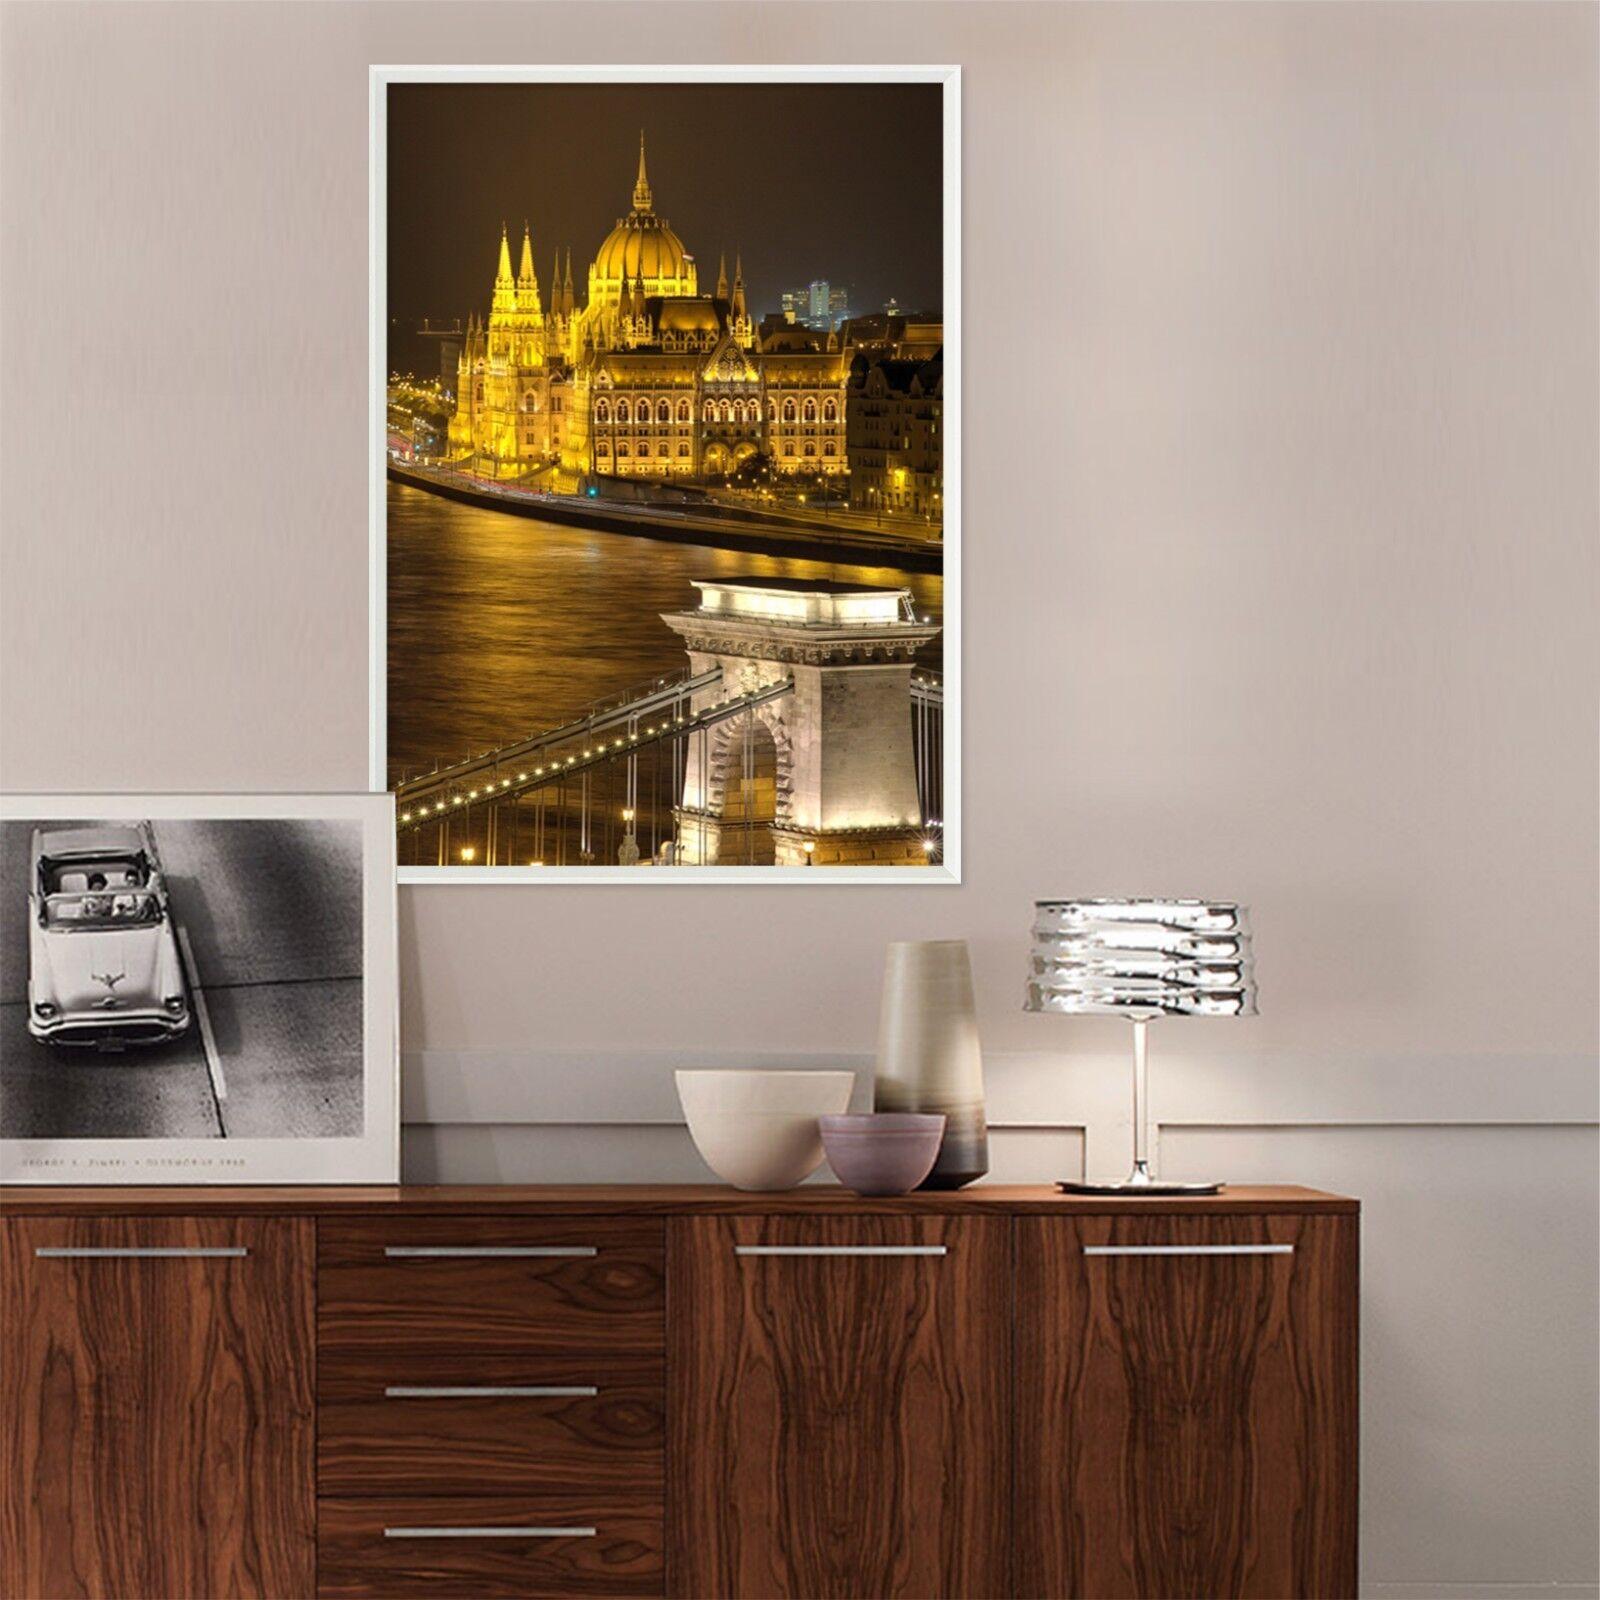 3D Europe Night View 3 Framed Poster Home Decor Print Painting Art AJ WALLPAPER